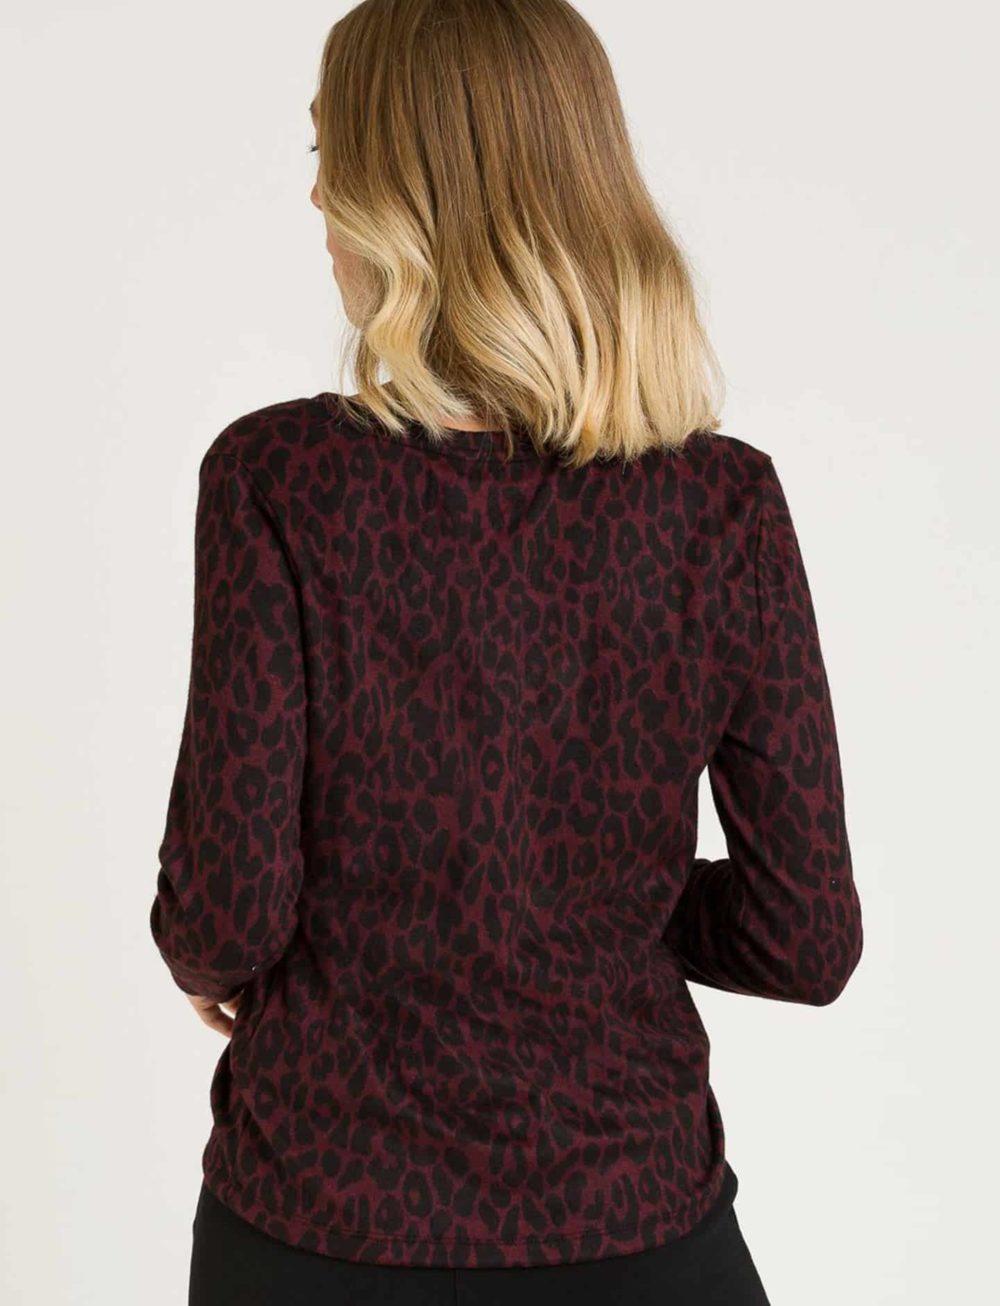 camiseta-estampado-animal-espalda